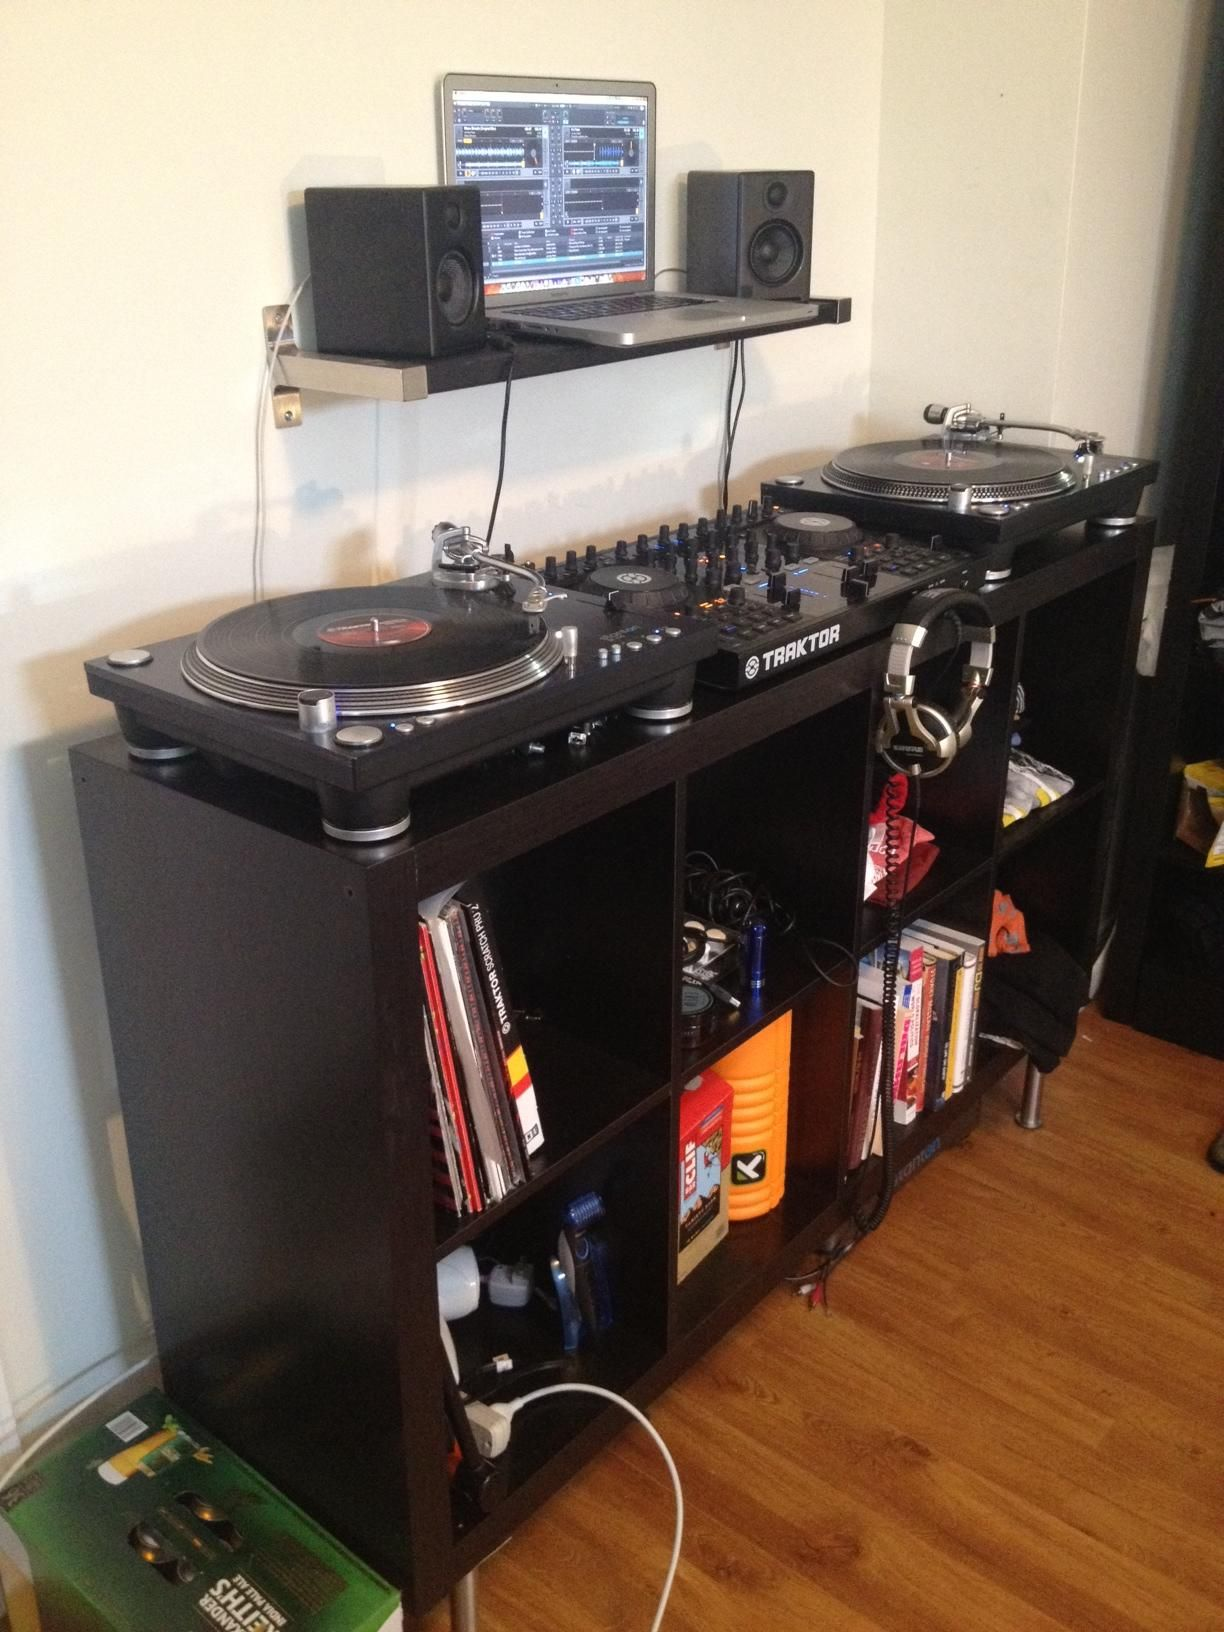 dj setup the dj 39 s booth dj setup home studio music dj equipment. Black Bedroom Furniture Sets. Home Design Ideas